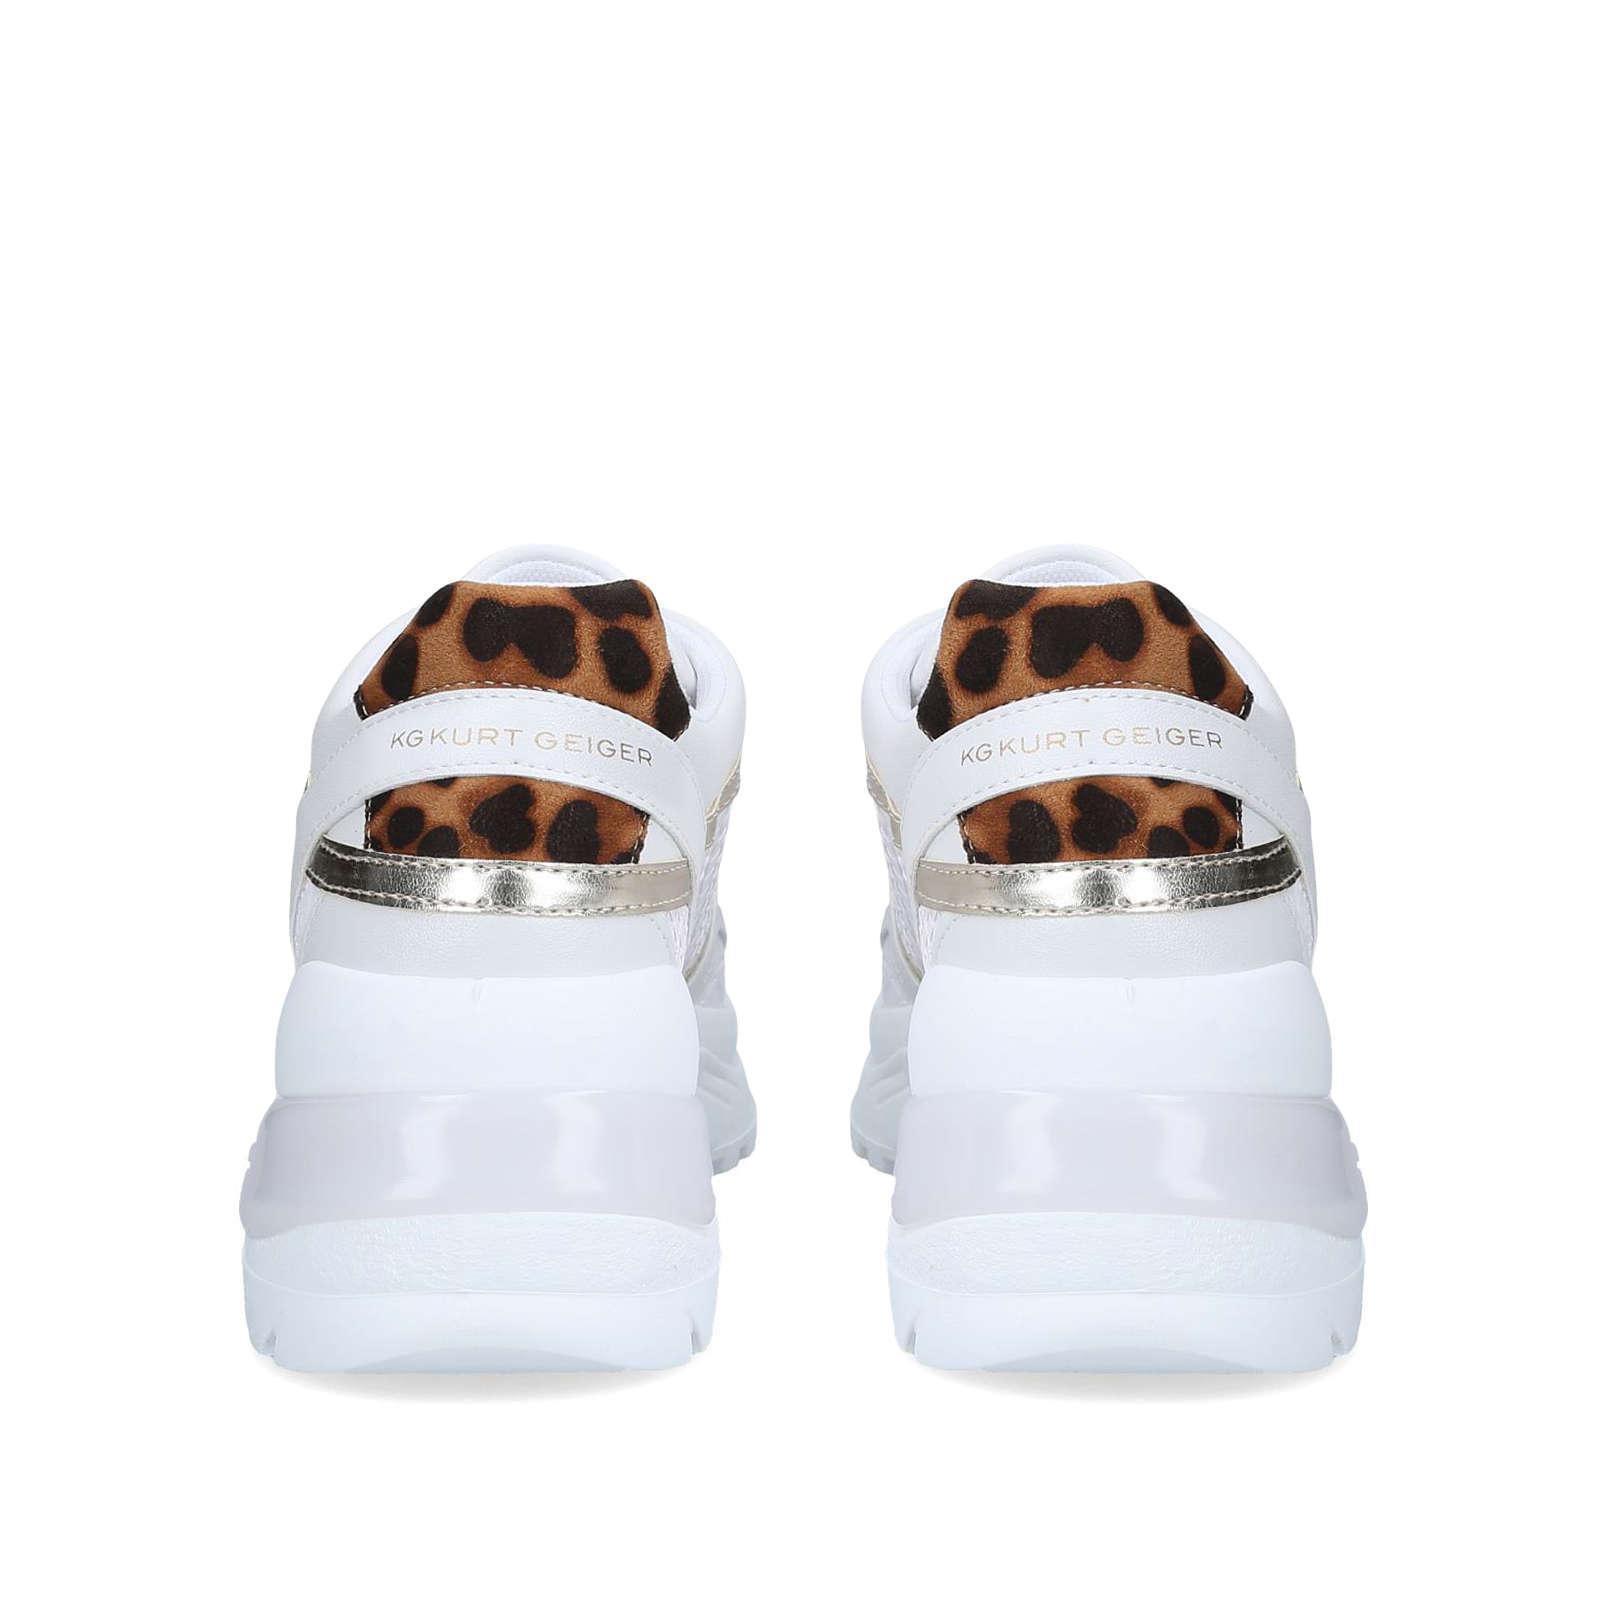 LIZZY - KG KURT GEIGER Sneakers